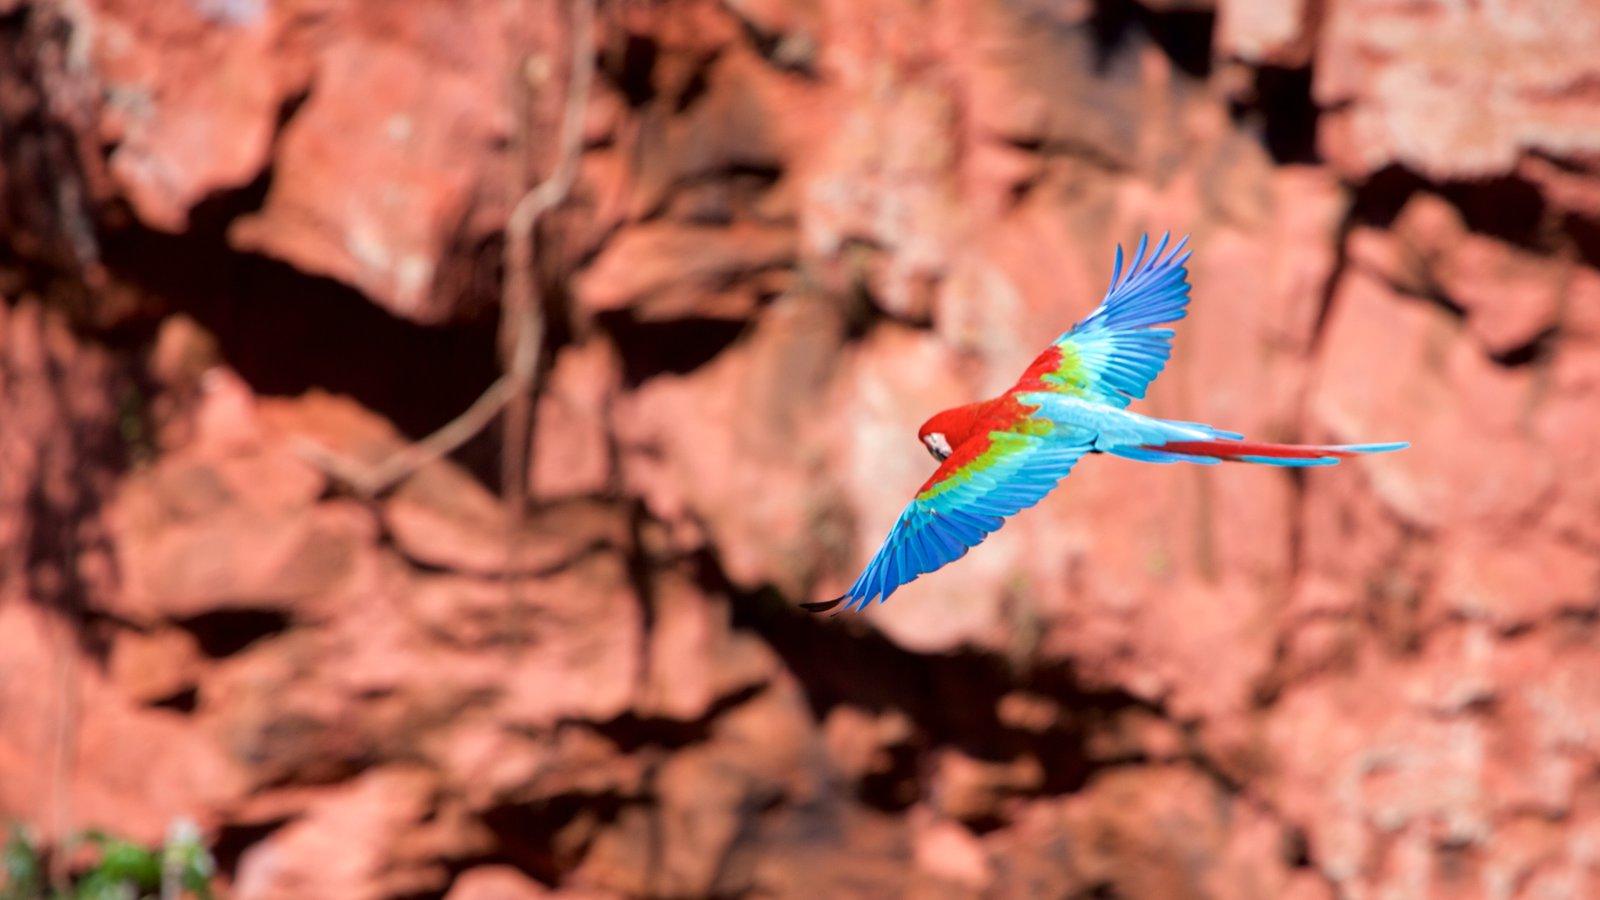 Bonito mostrando vida das aves